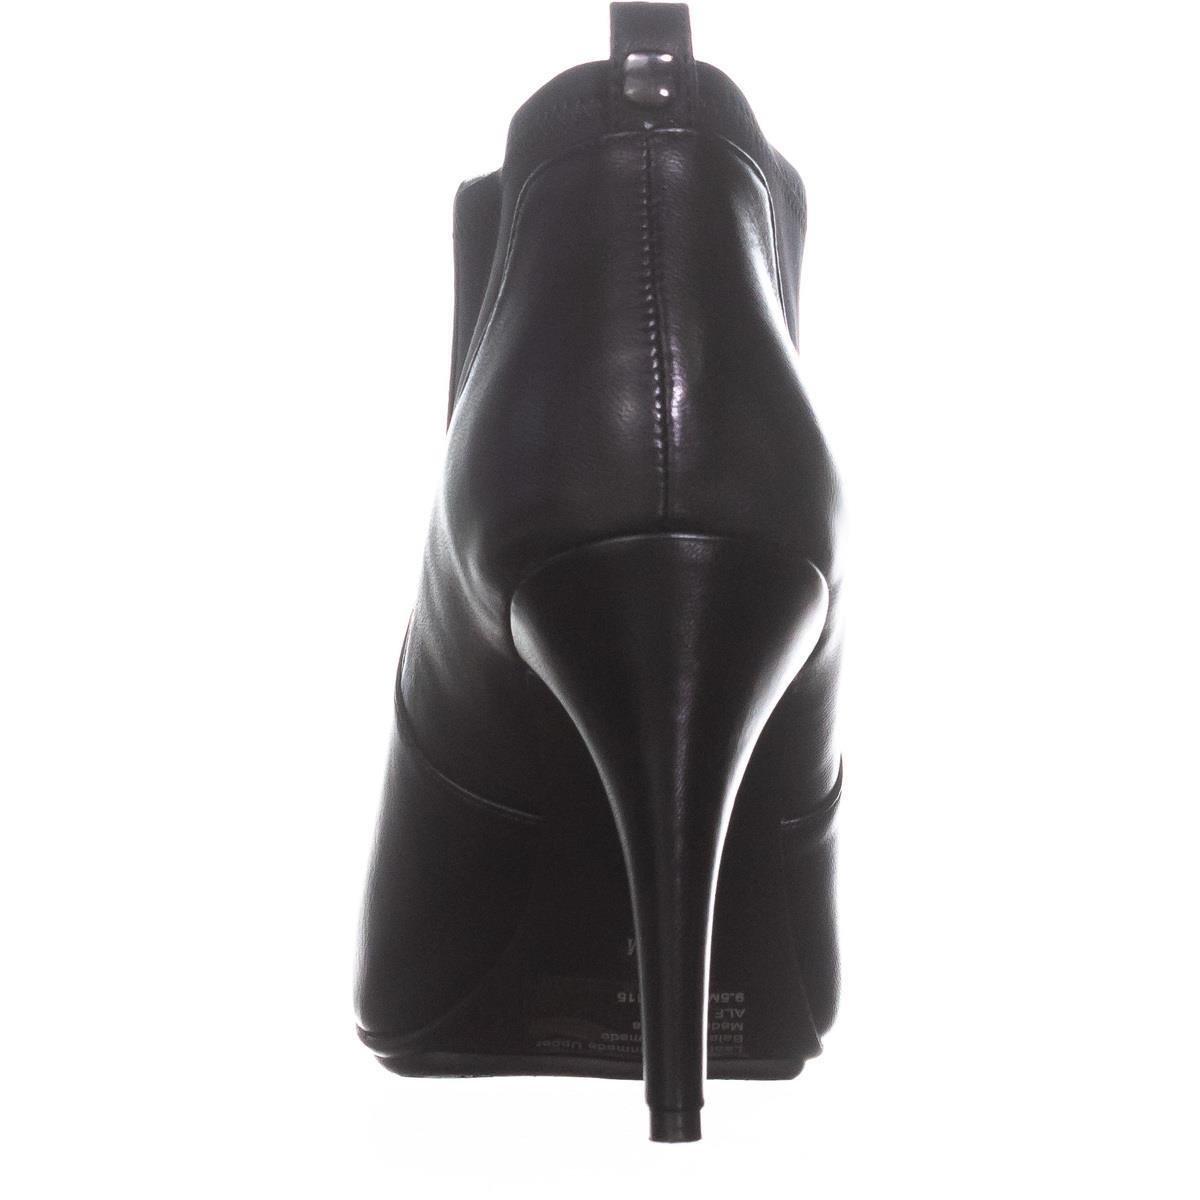 Frauen Geschlossener Geschlossener Geschlossener Zeh Leder Fashion Stiefel 69f647